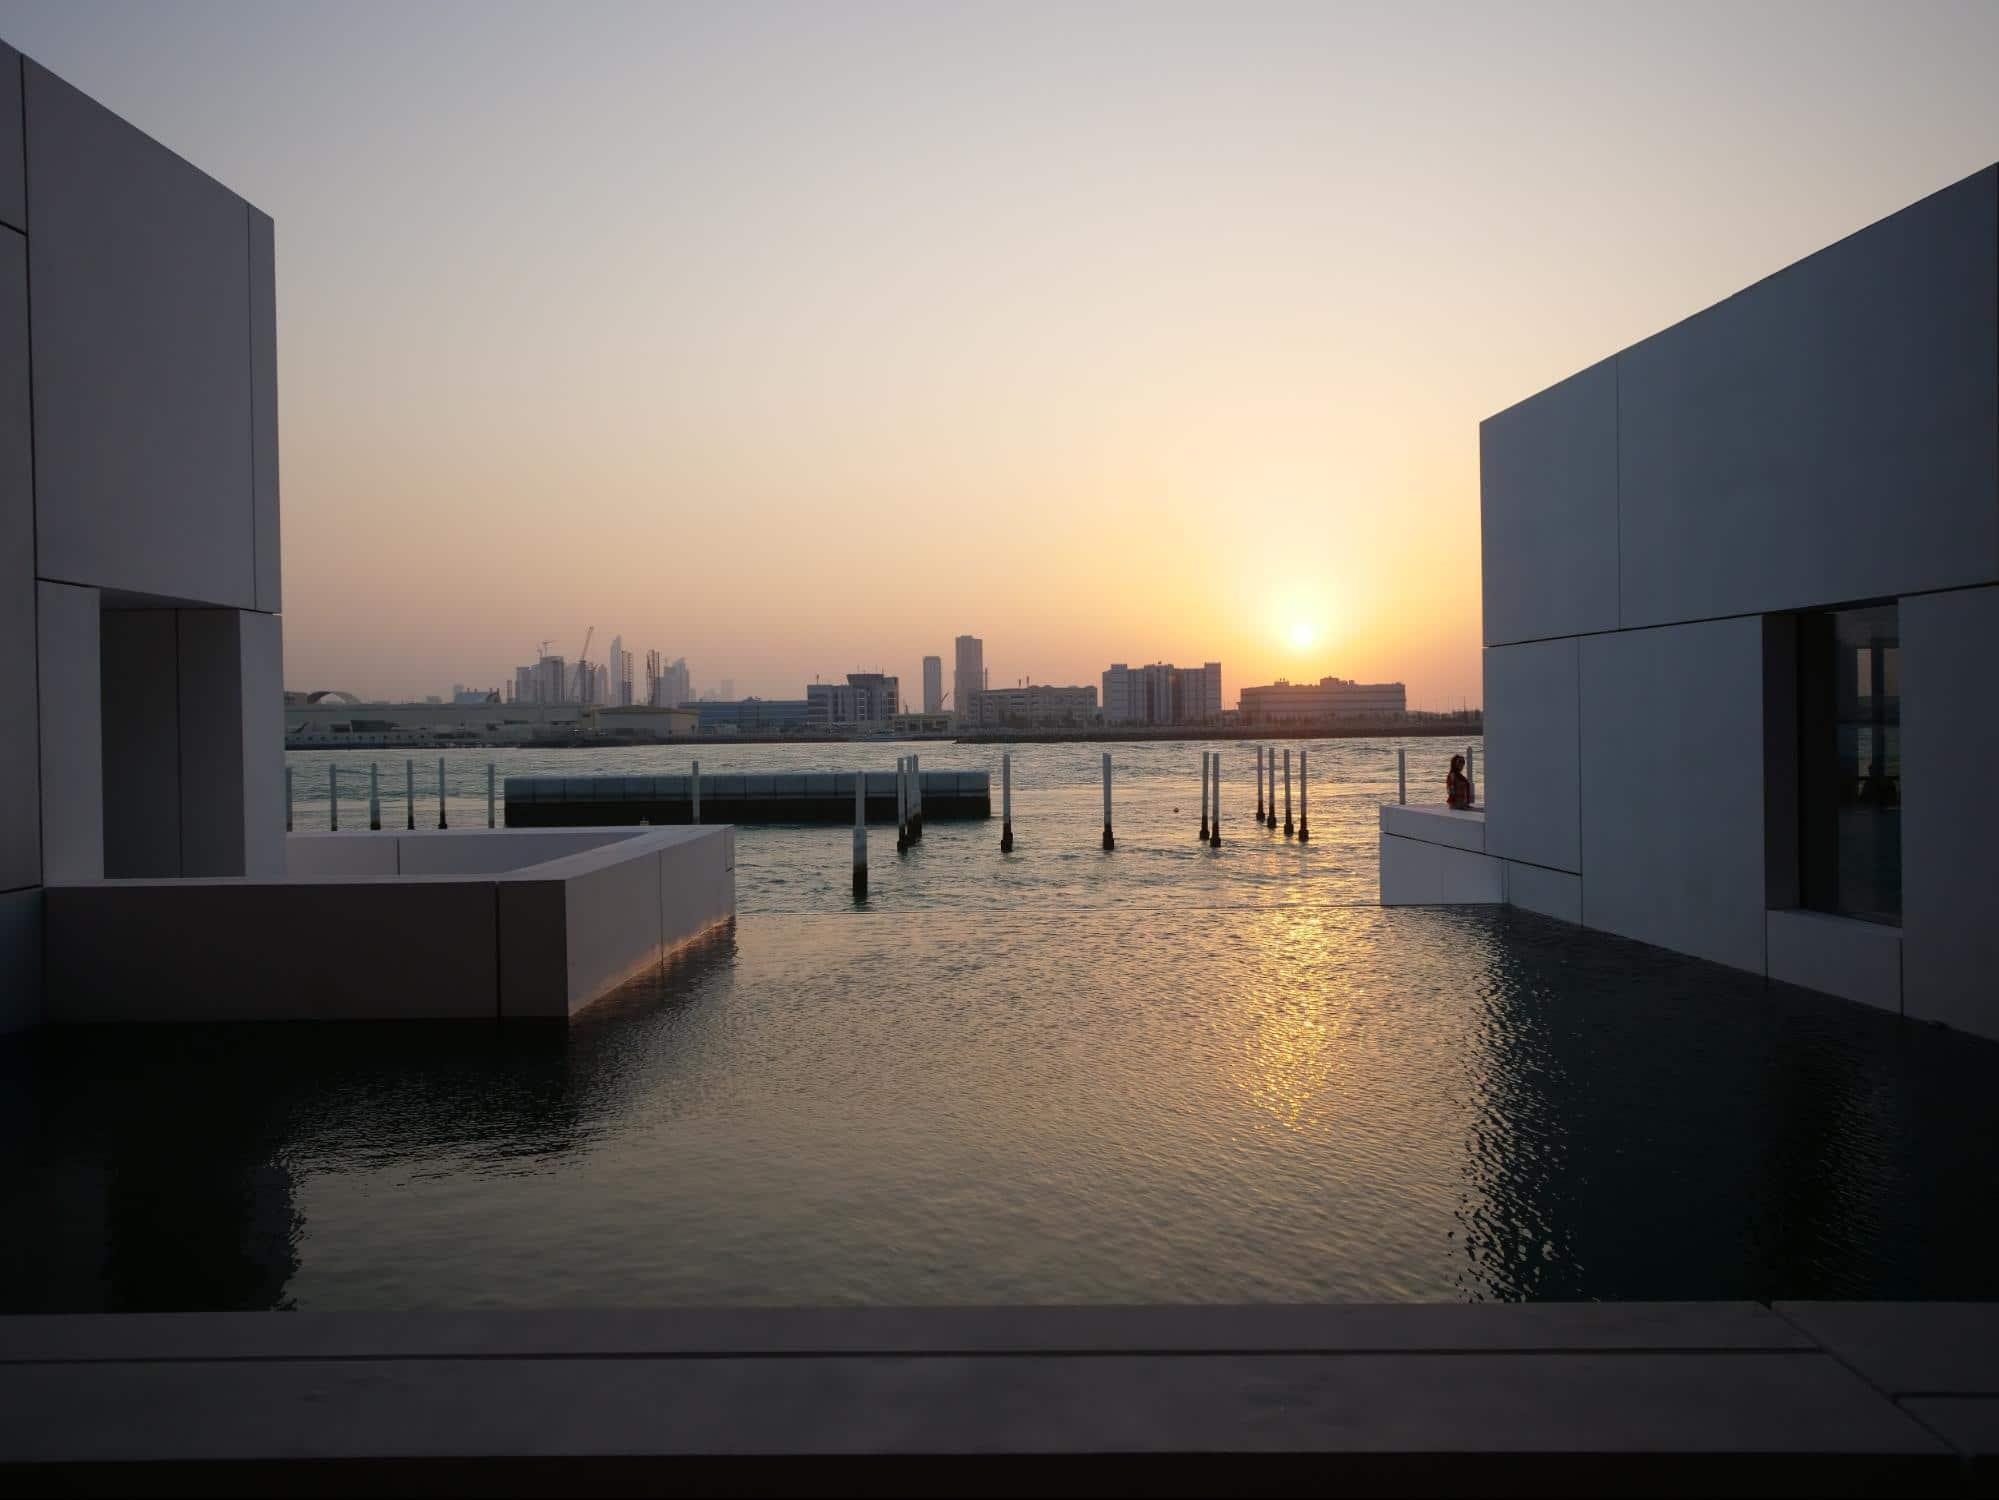 The Louvre Museum Abu Dhabi sunset